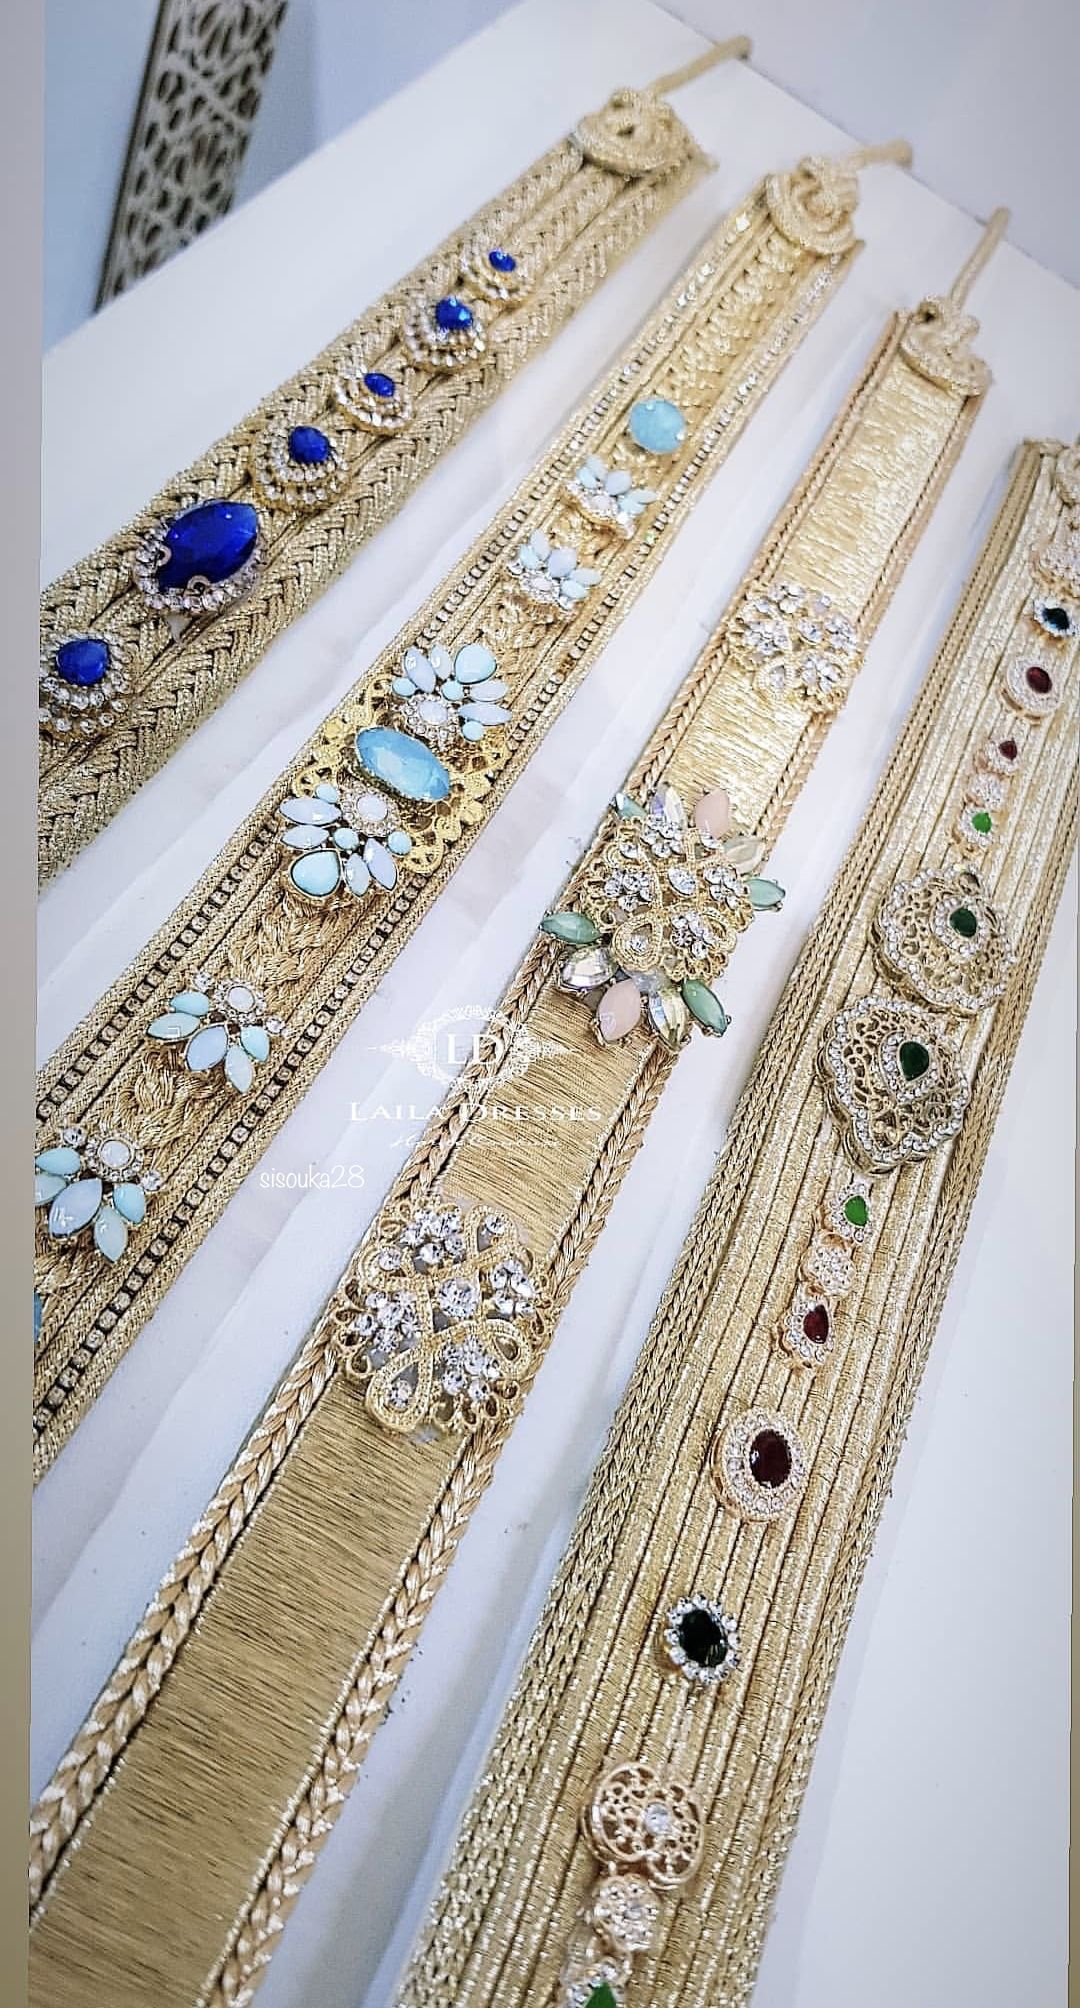 Strass Serre-tête Mariage Costume Applique Bling Perles Strass Robe Motif